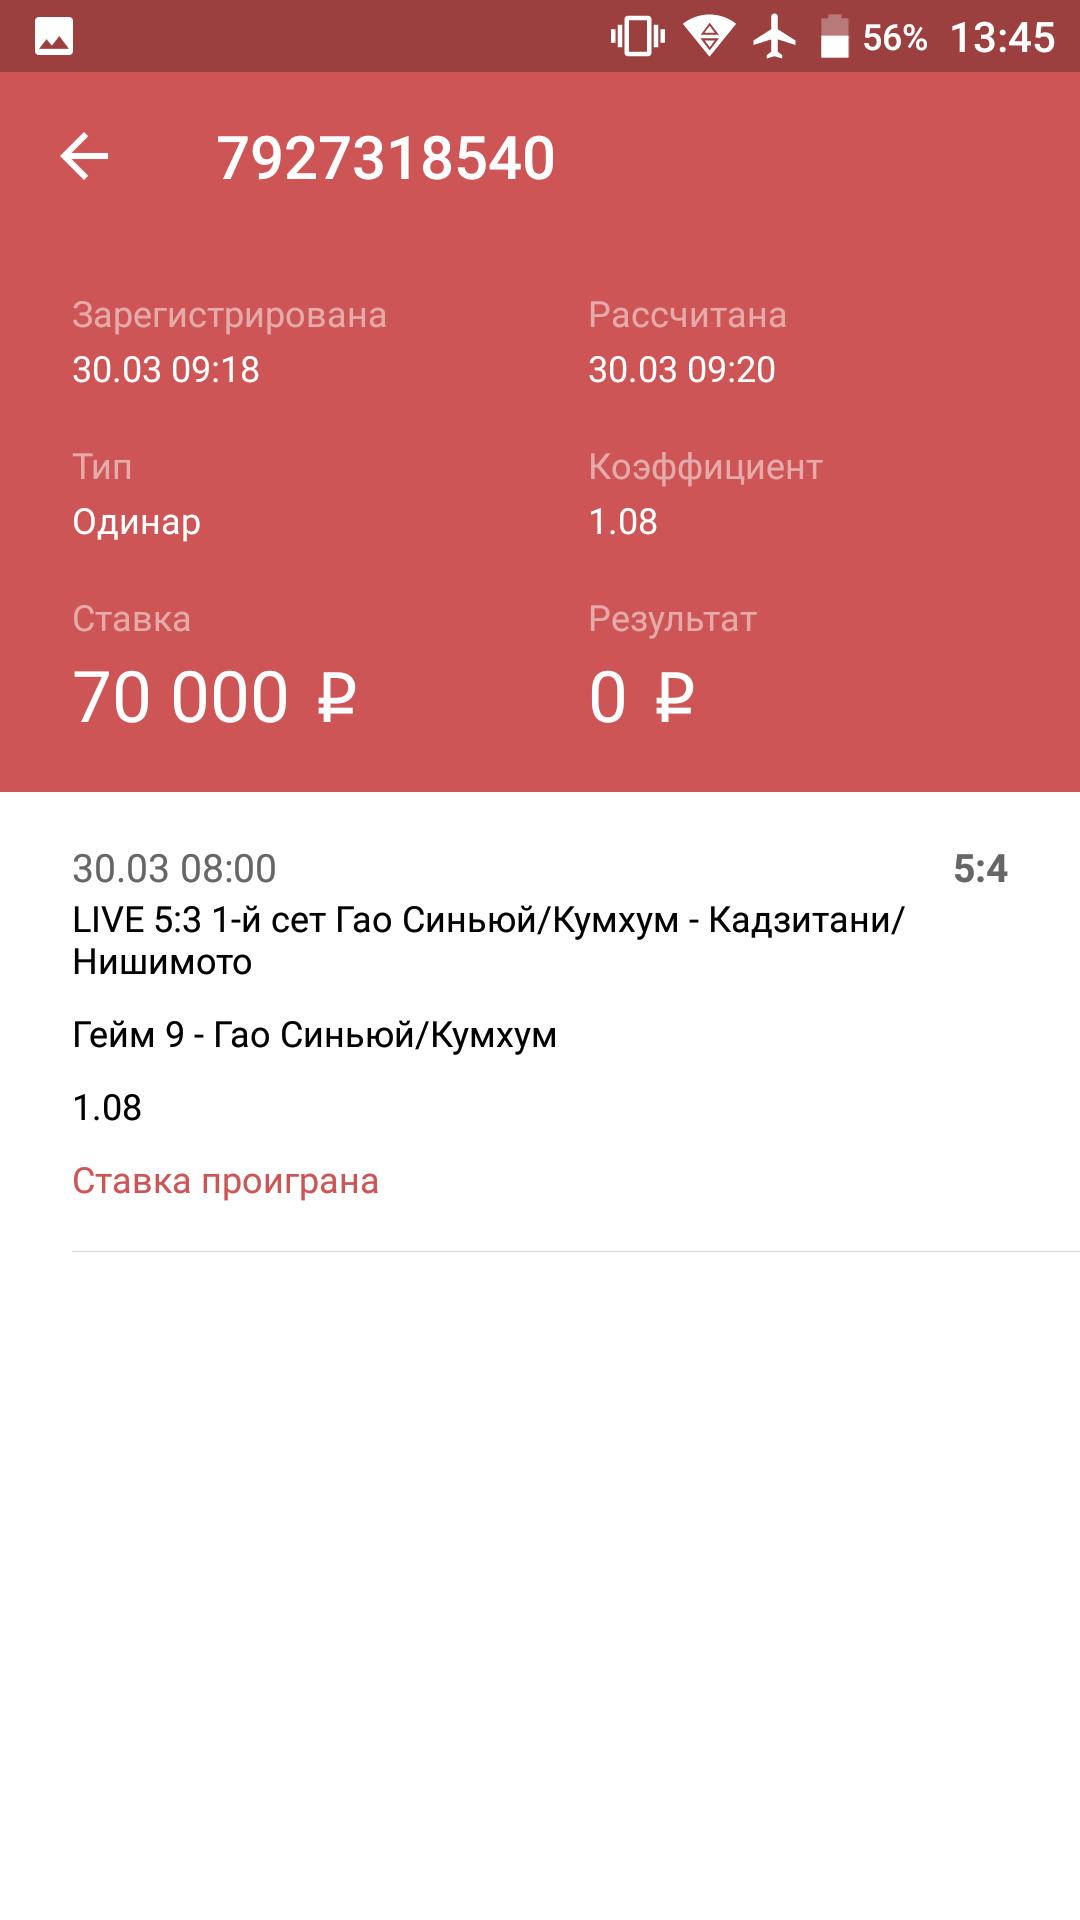 Screenshot_20180625-134556.png